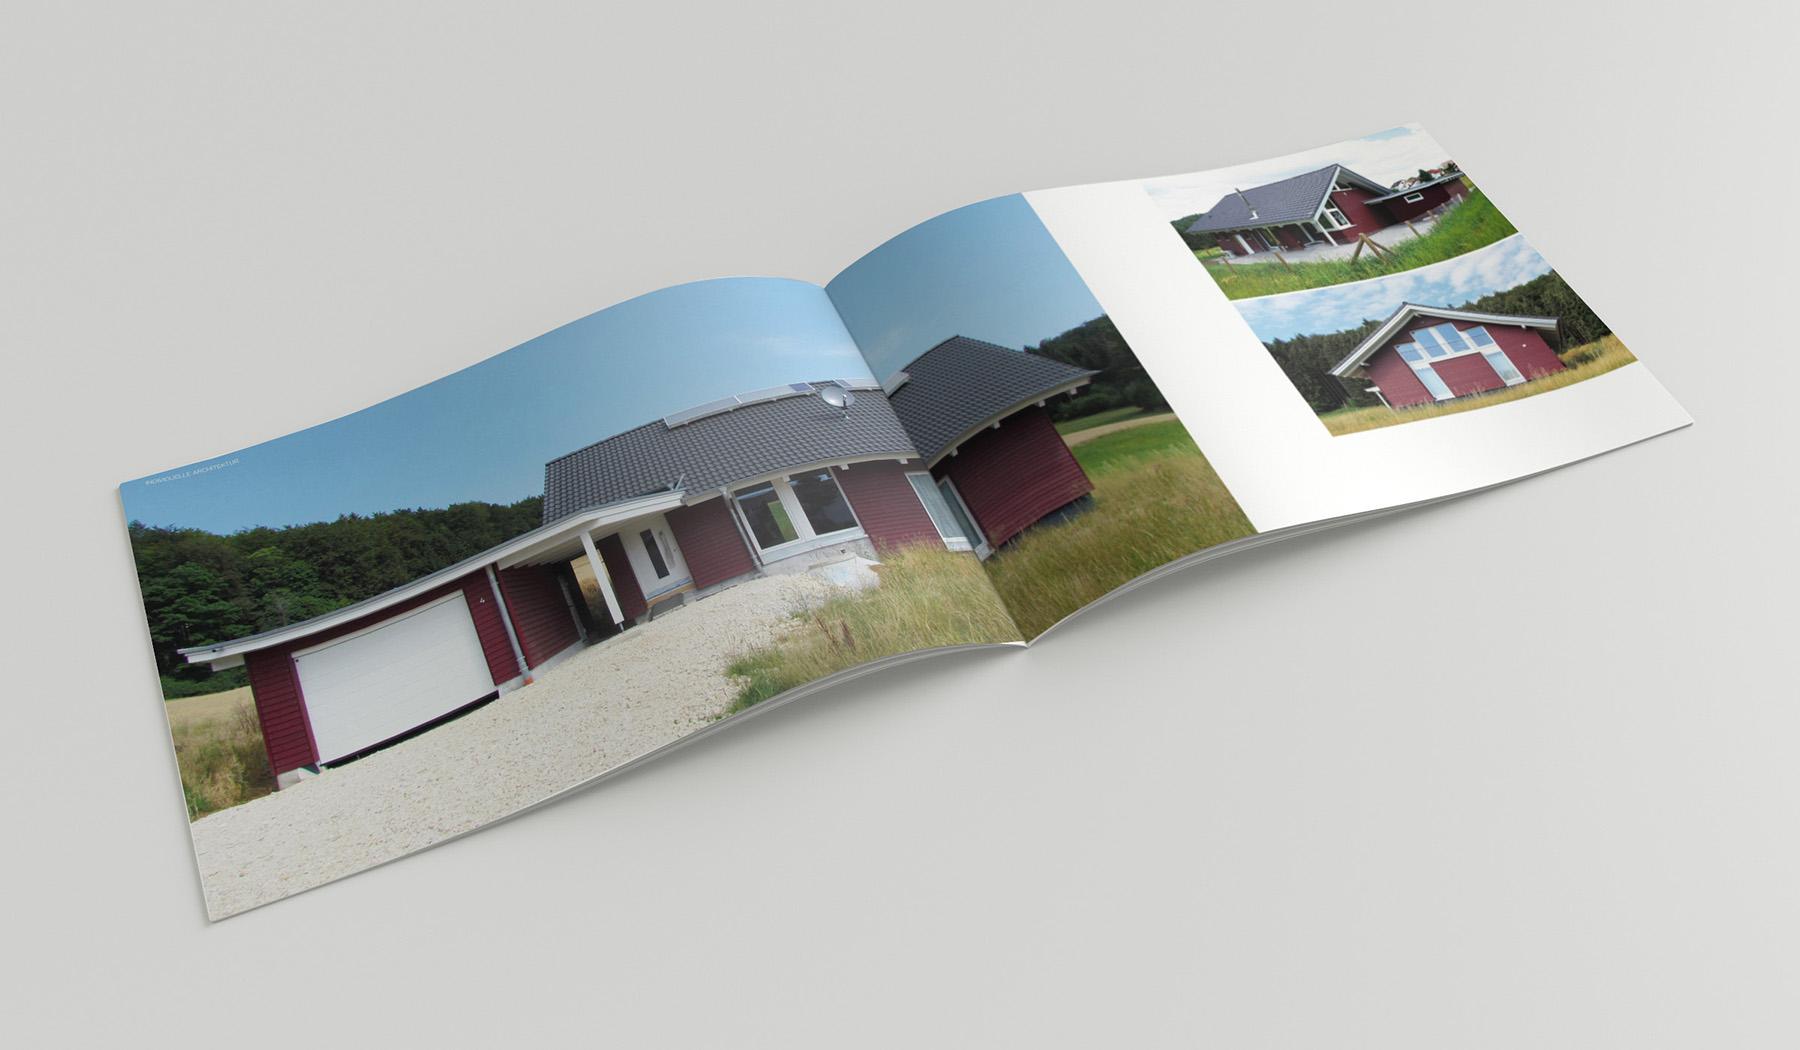 ROLF DAN-PROJEKT – Imagebroschüre